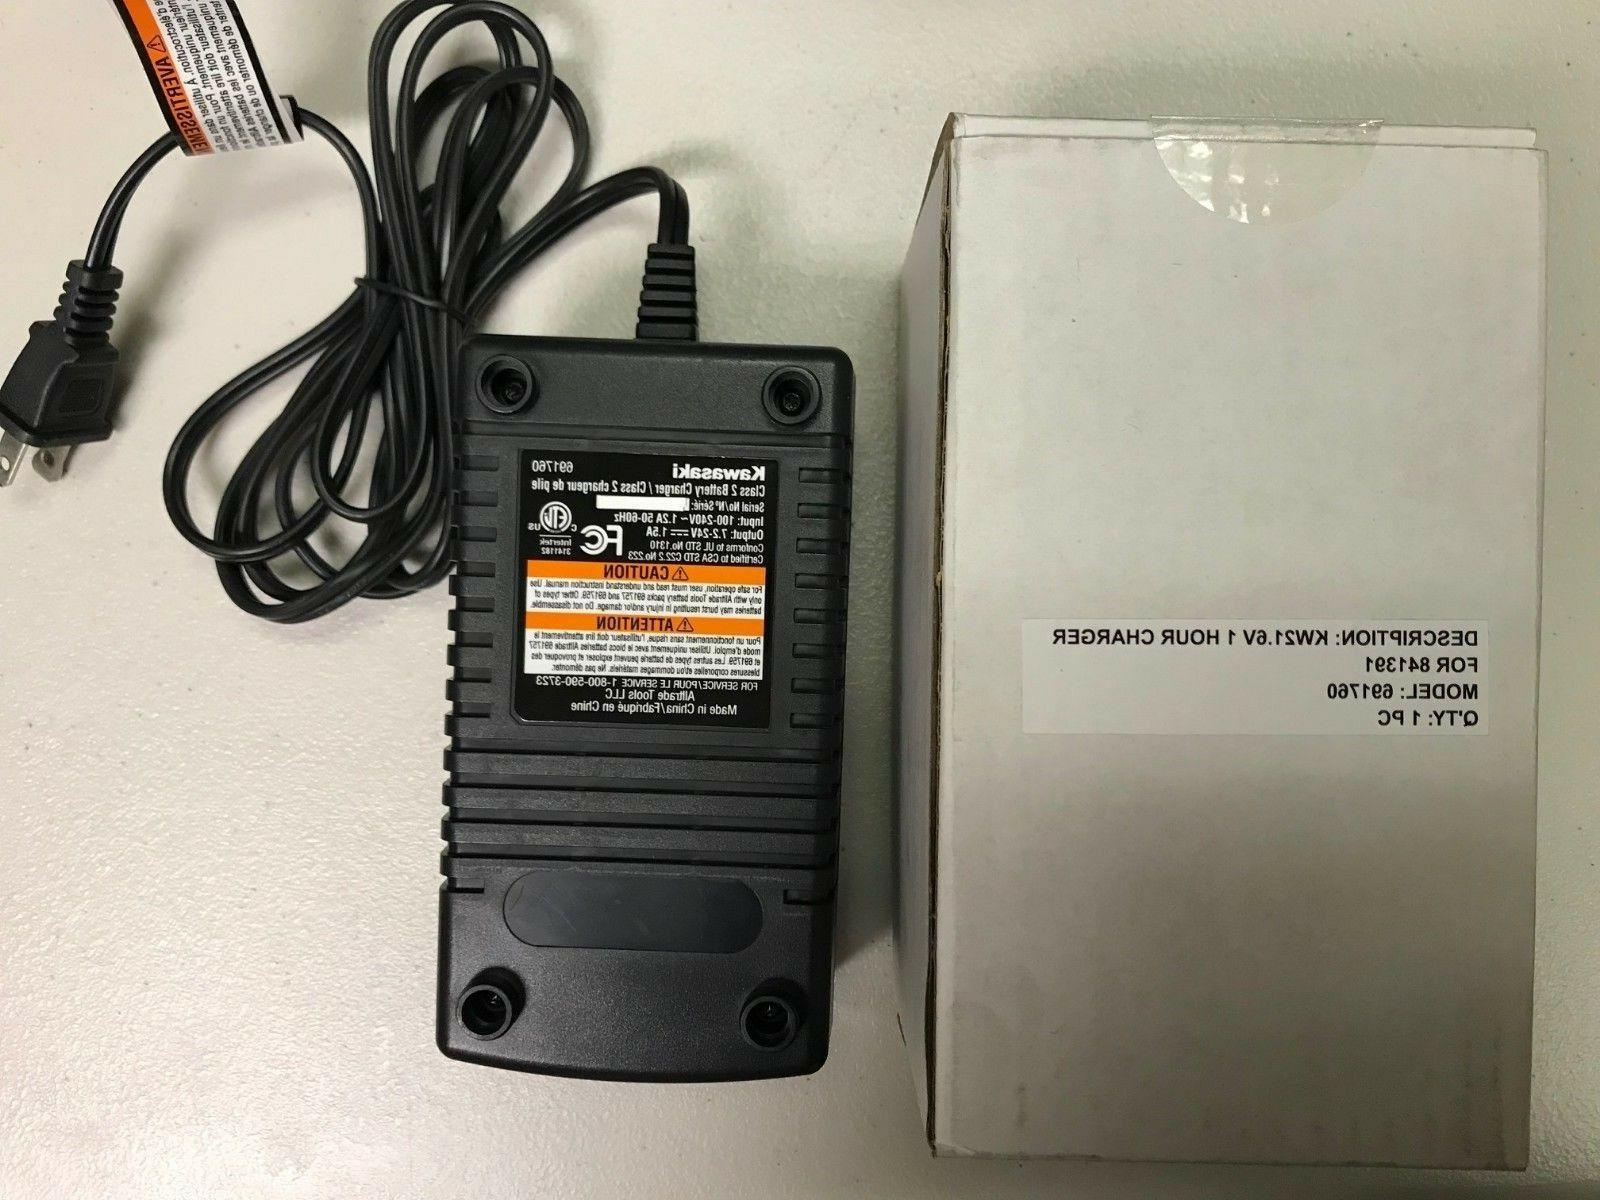 2 KW21.6V Cordless Battery